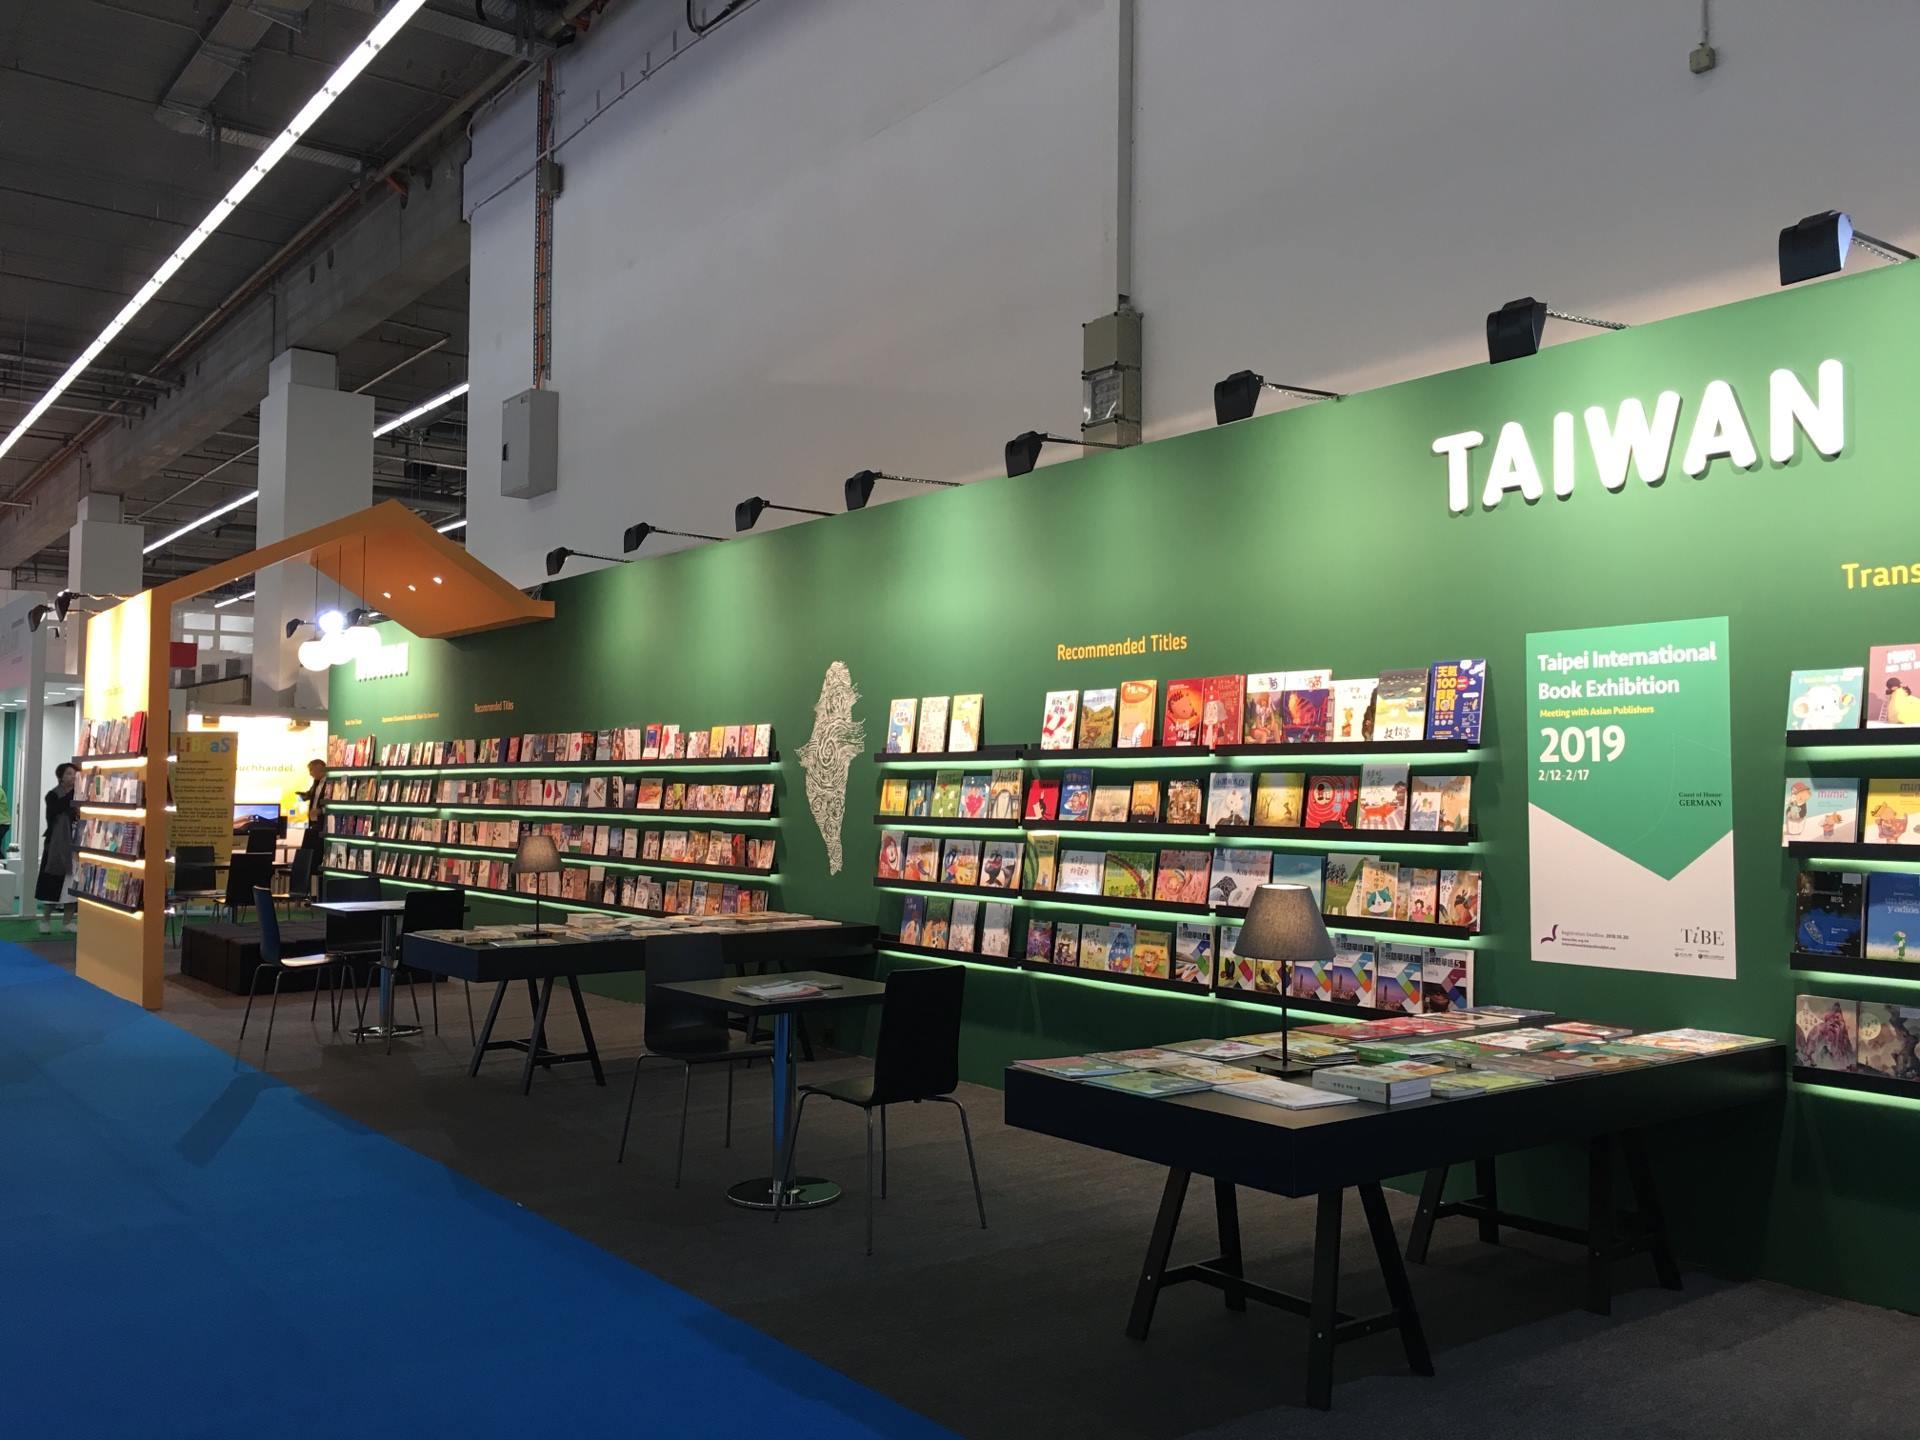 Taiwan highlights its open, free values at Frankfurt book fair